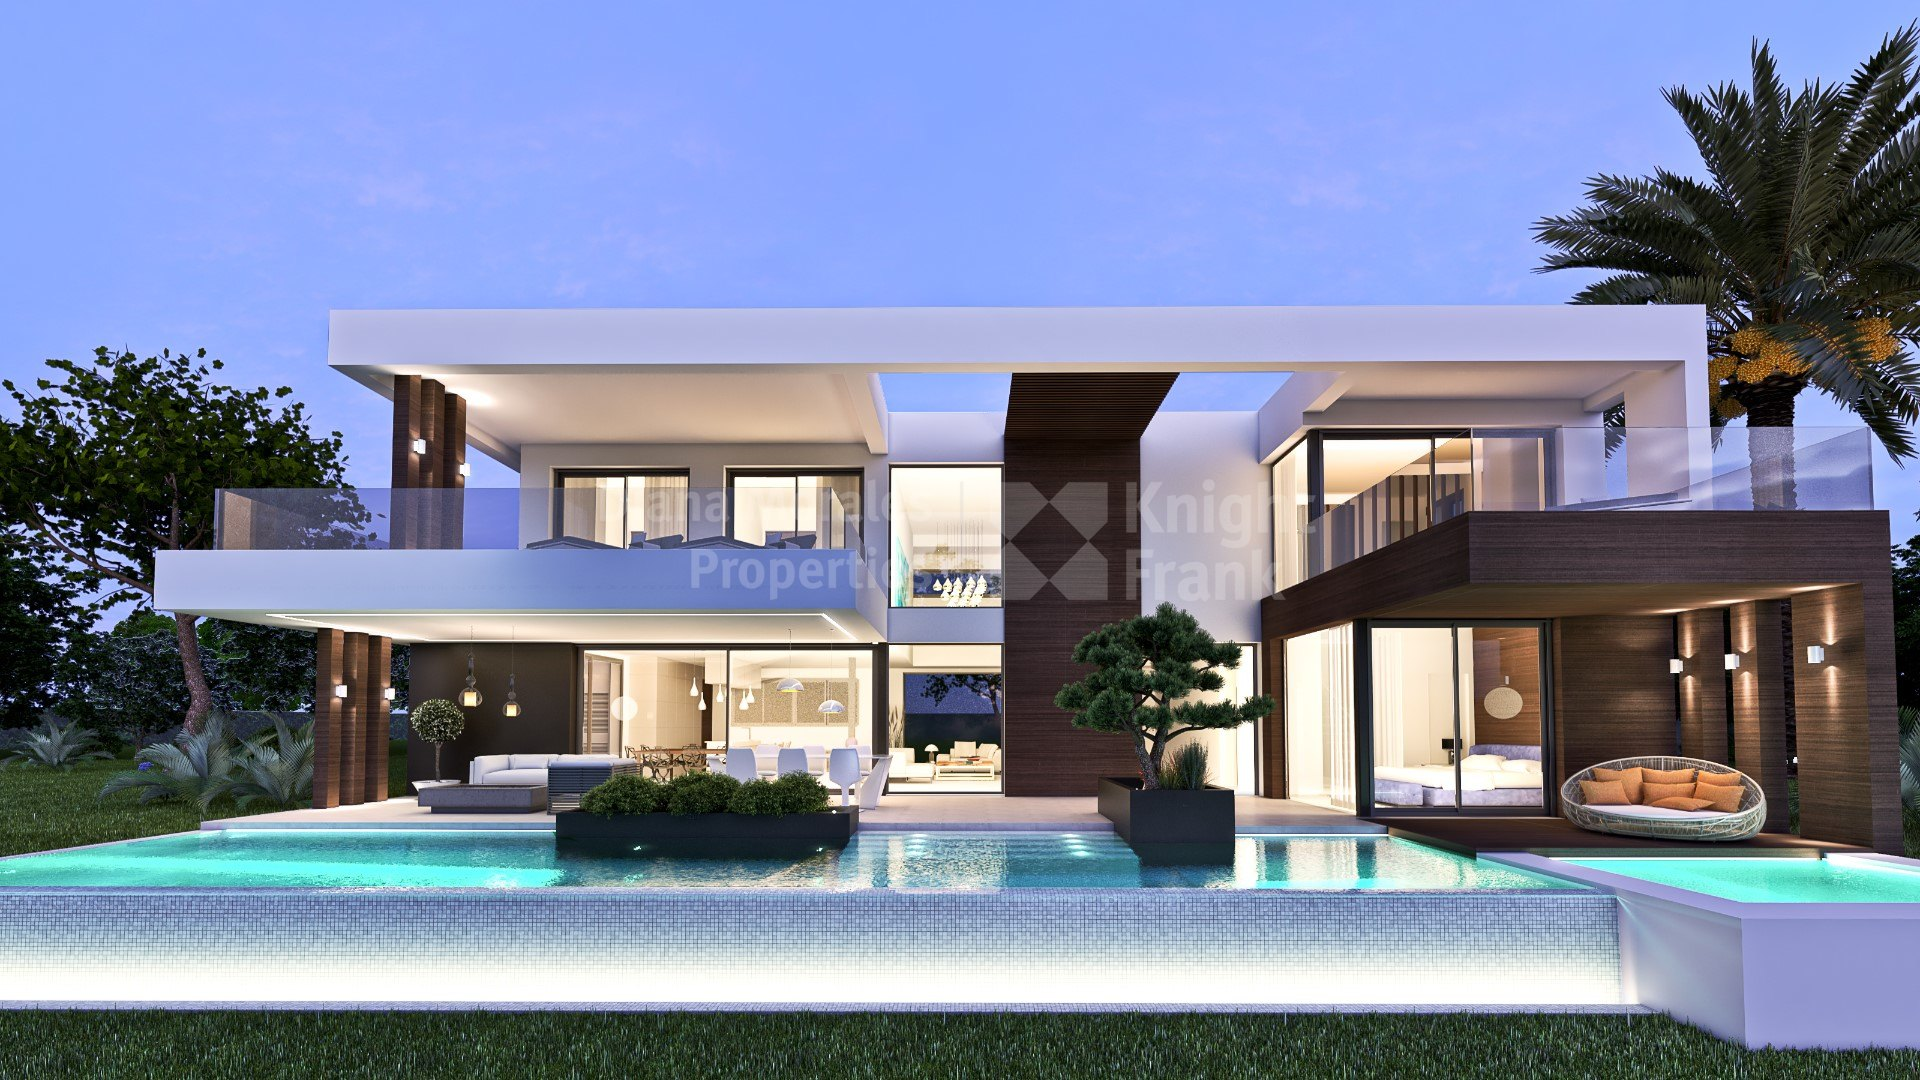 Cancelada modern villa under construction in a 13 unit complex